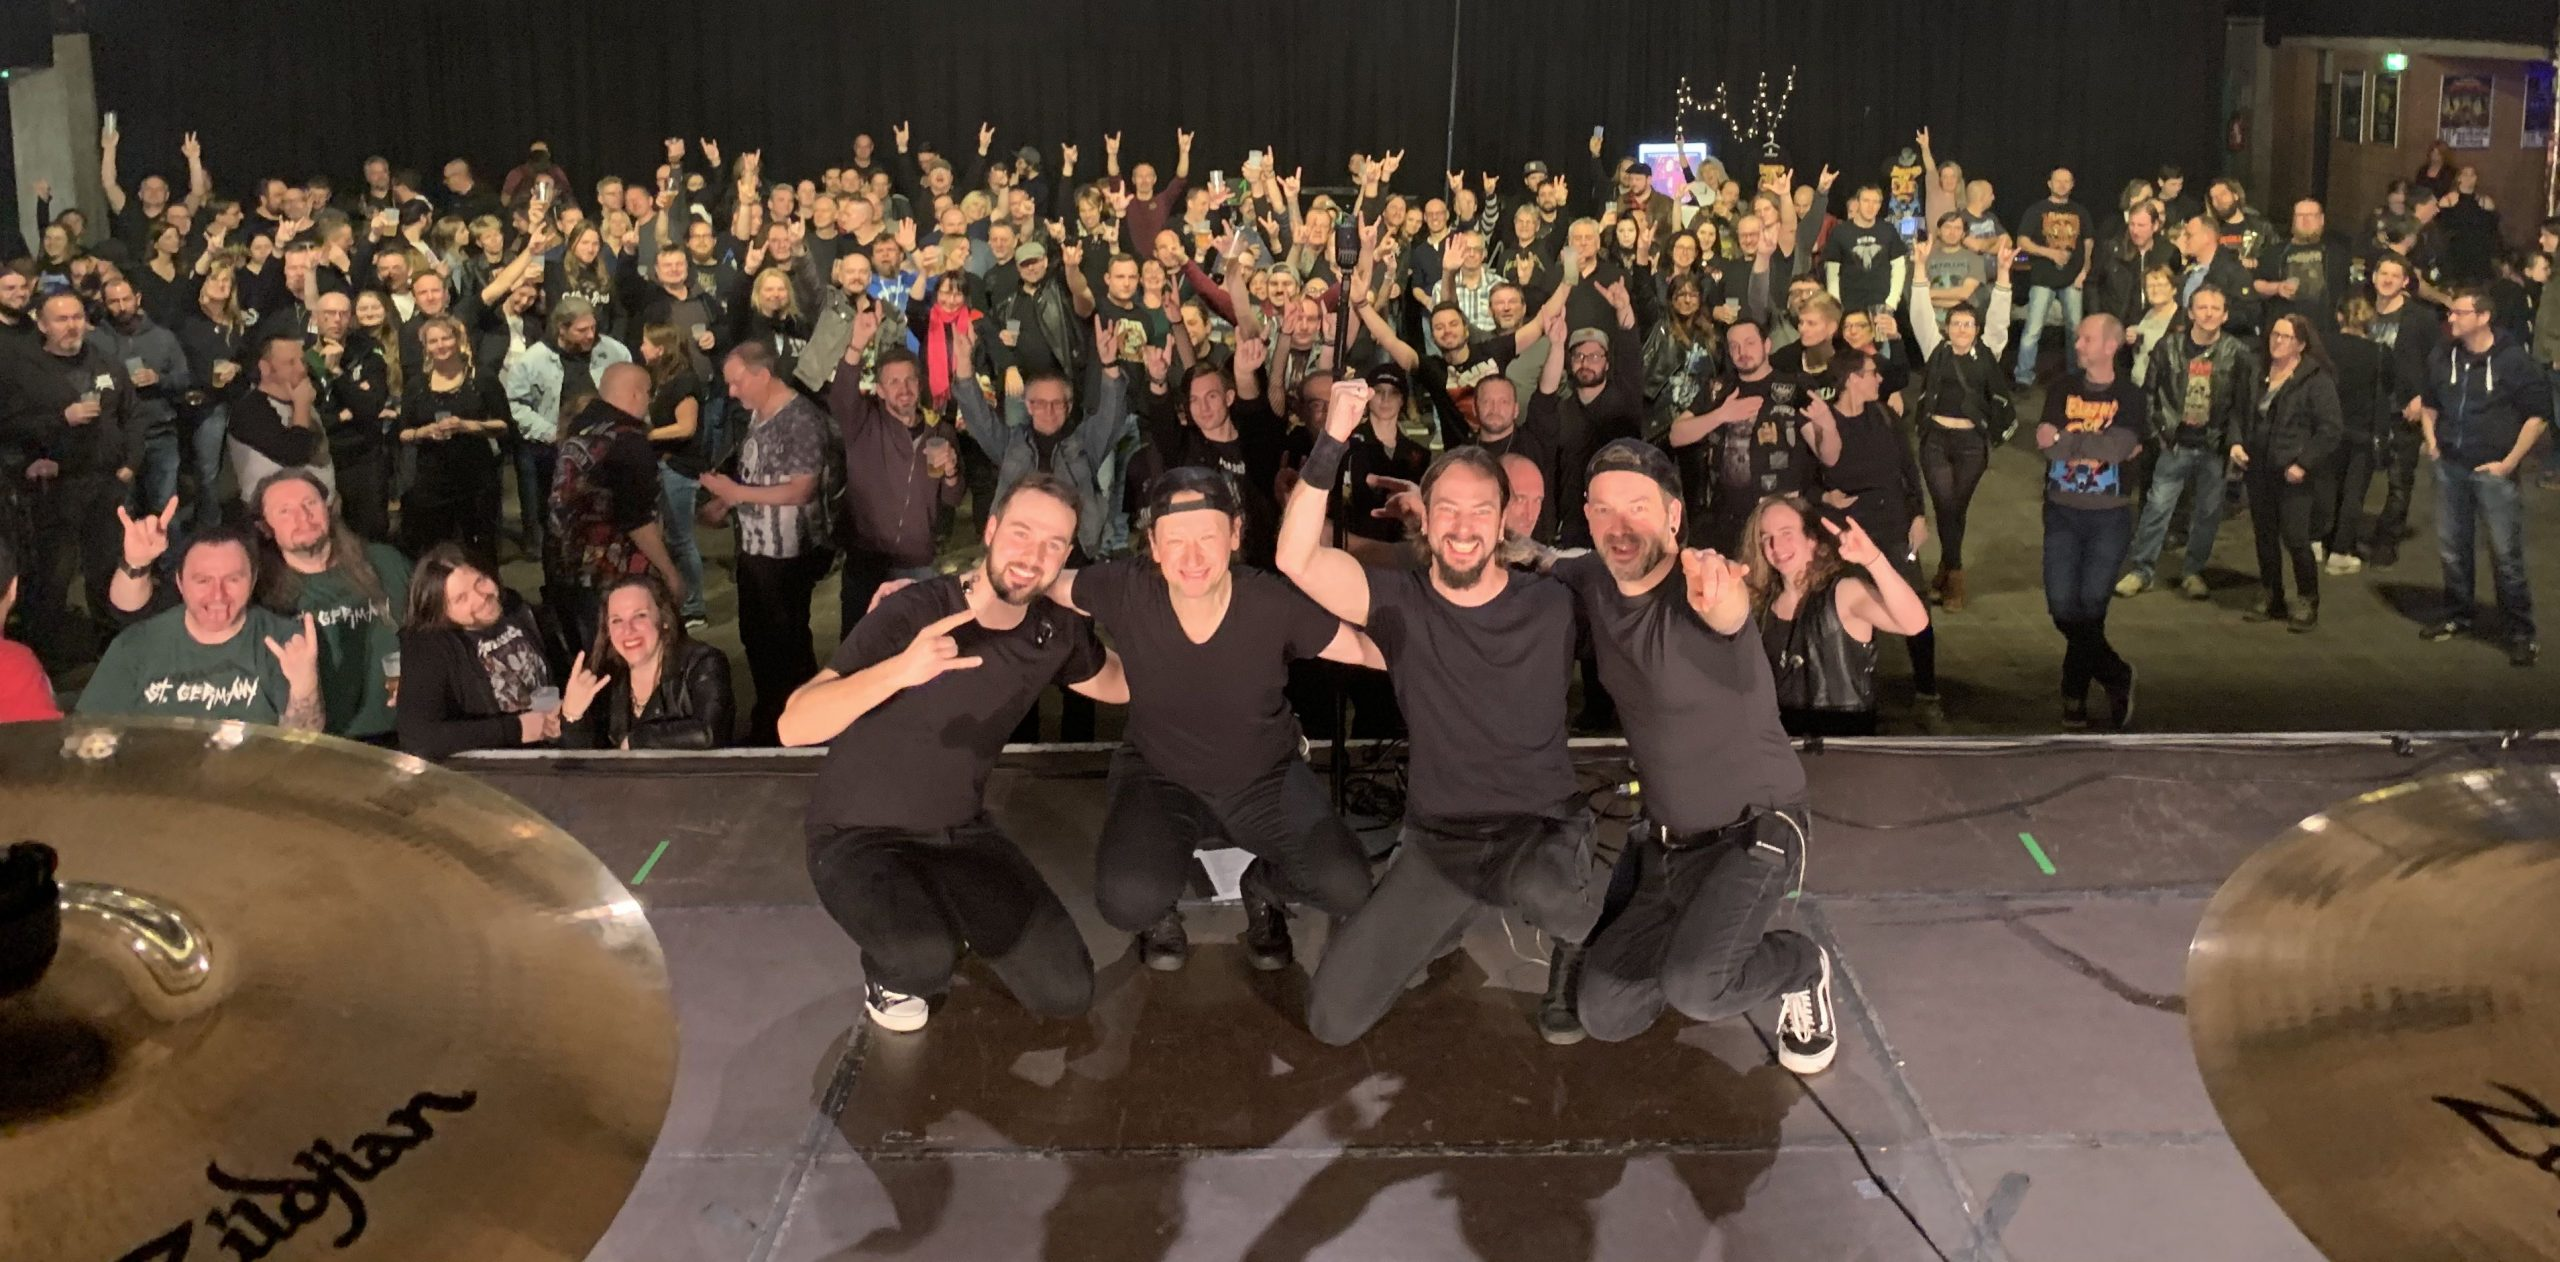 mytallica-tribute-band-deutschland-wuerzburg-posthalle-thankyou-2020_lowres